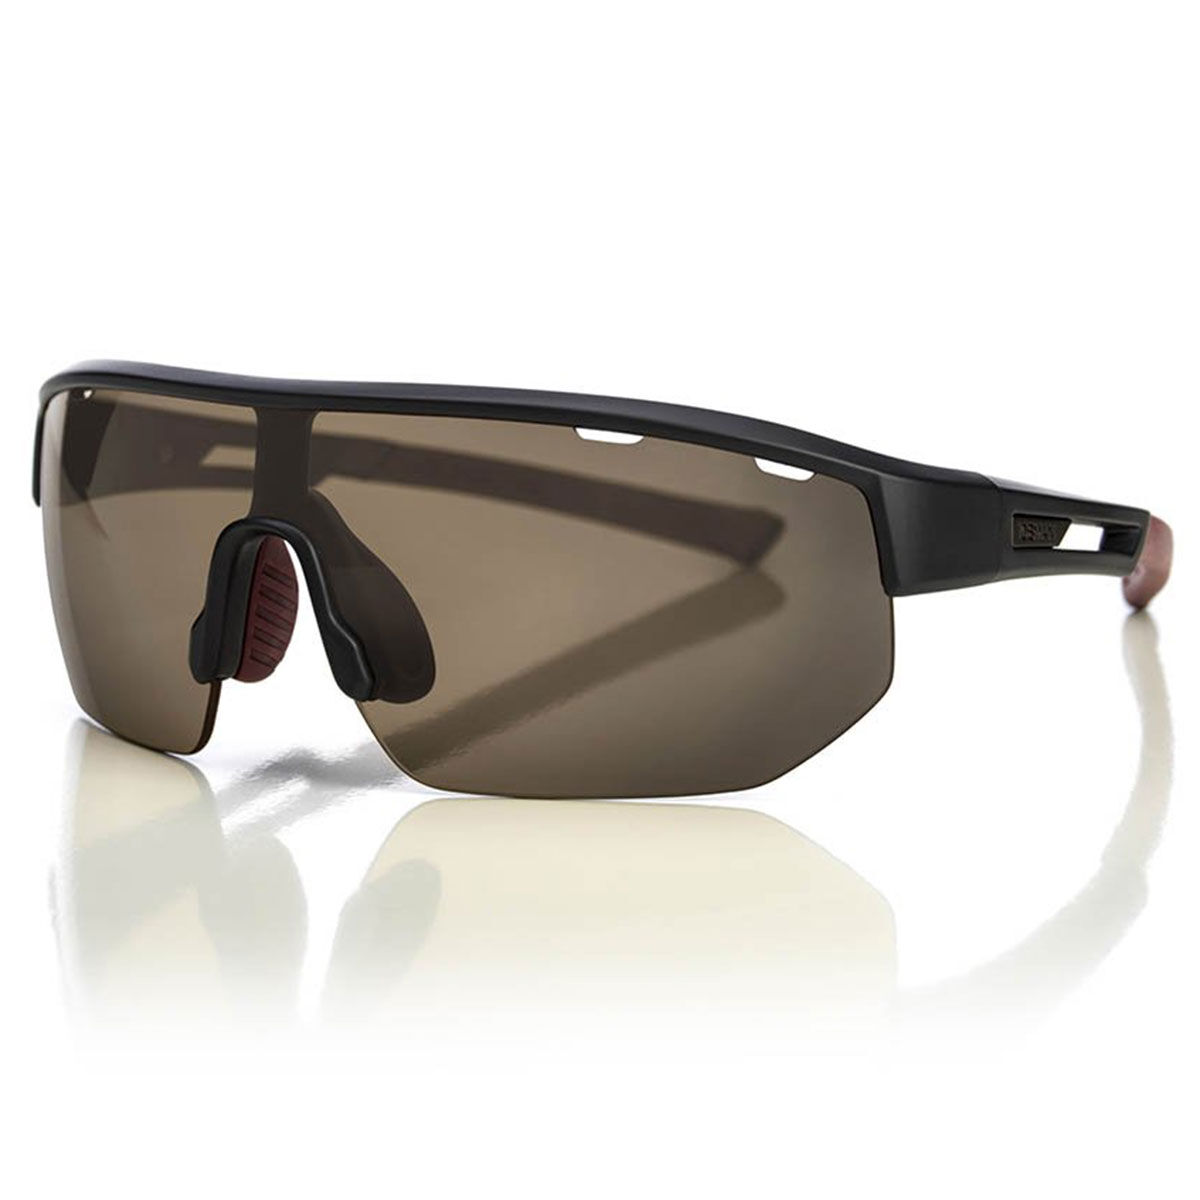 Henrik Stenson Iceman 3.0 Sunglasses, Mens, Grey/pastel/brown/bronze | American Golf